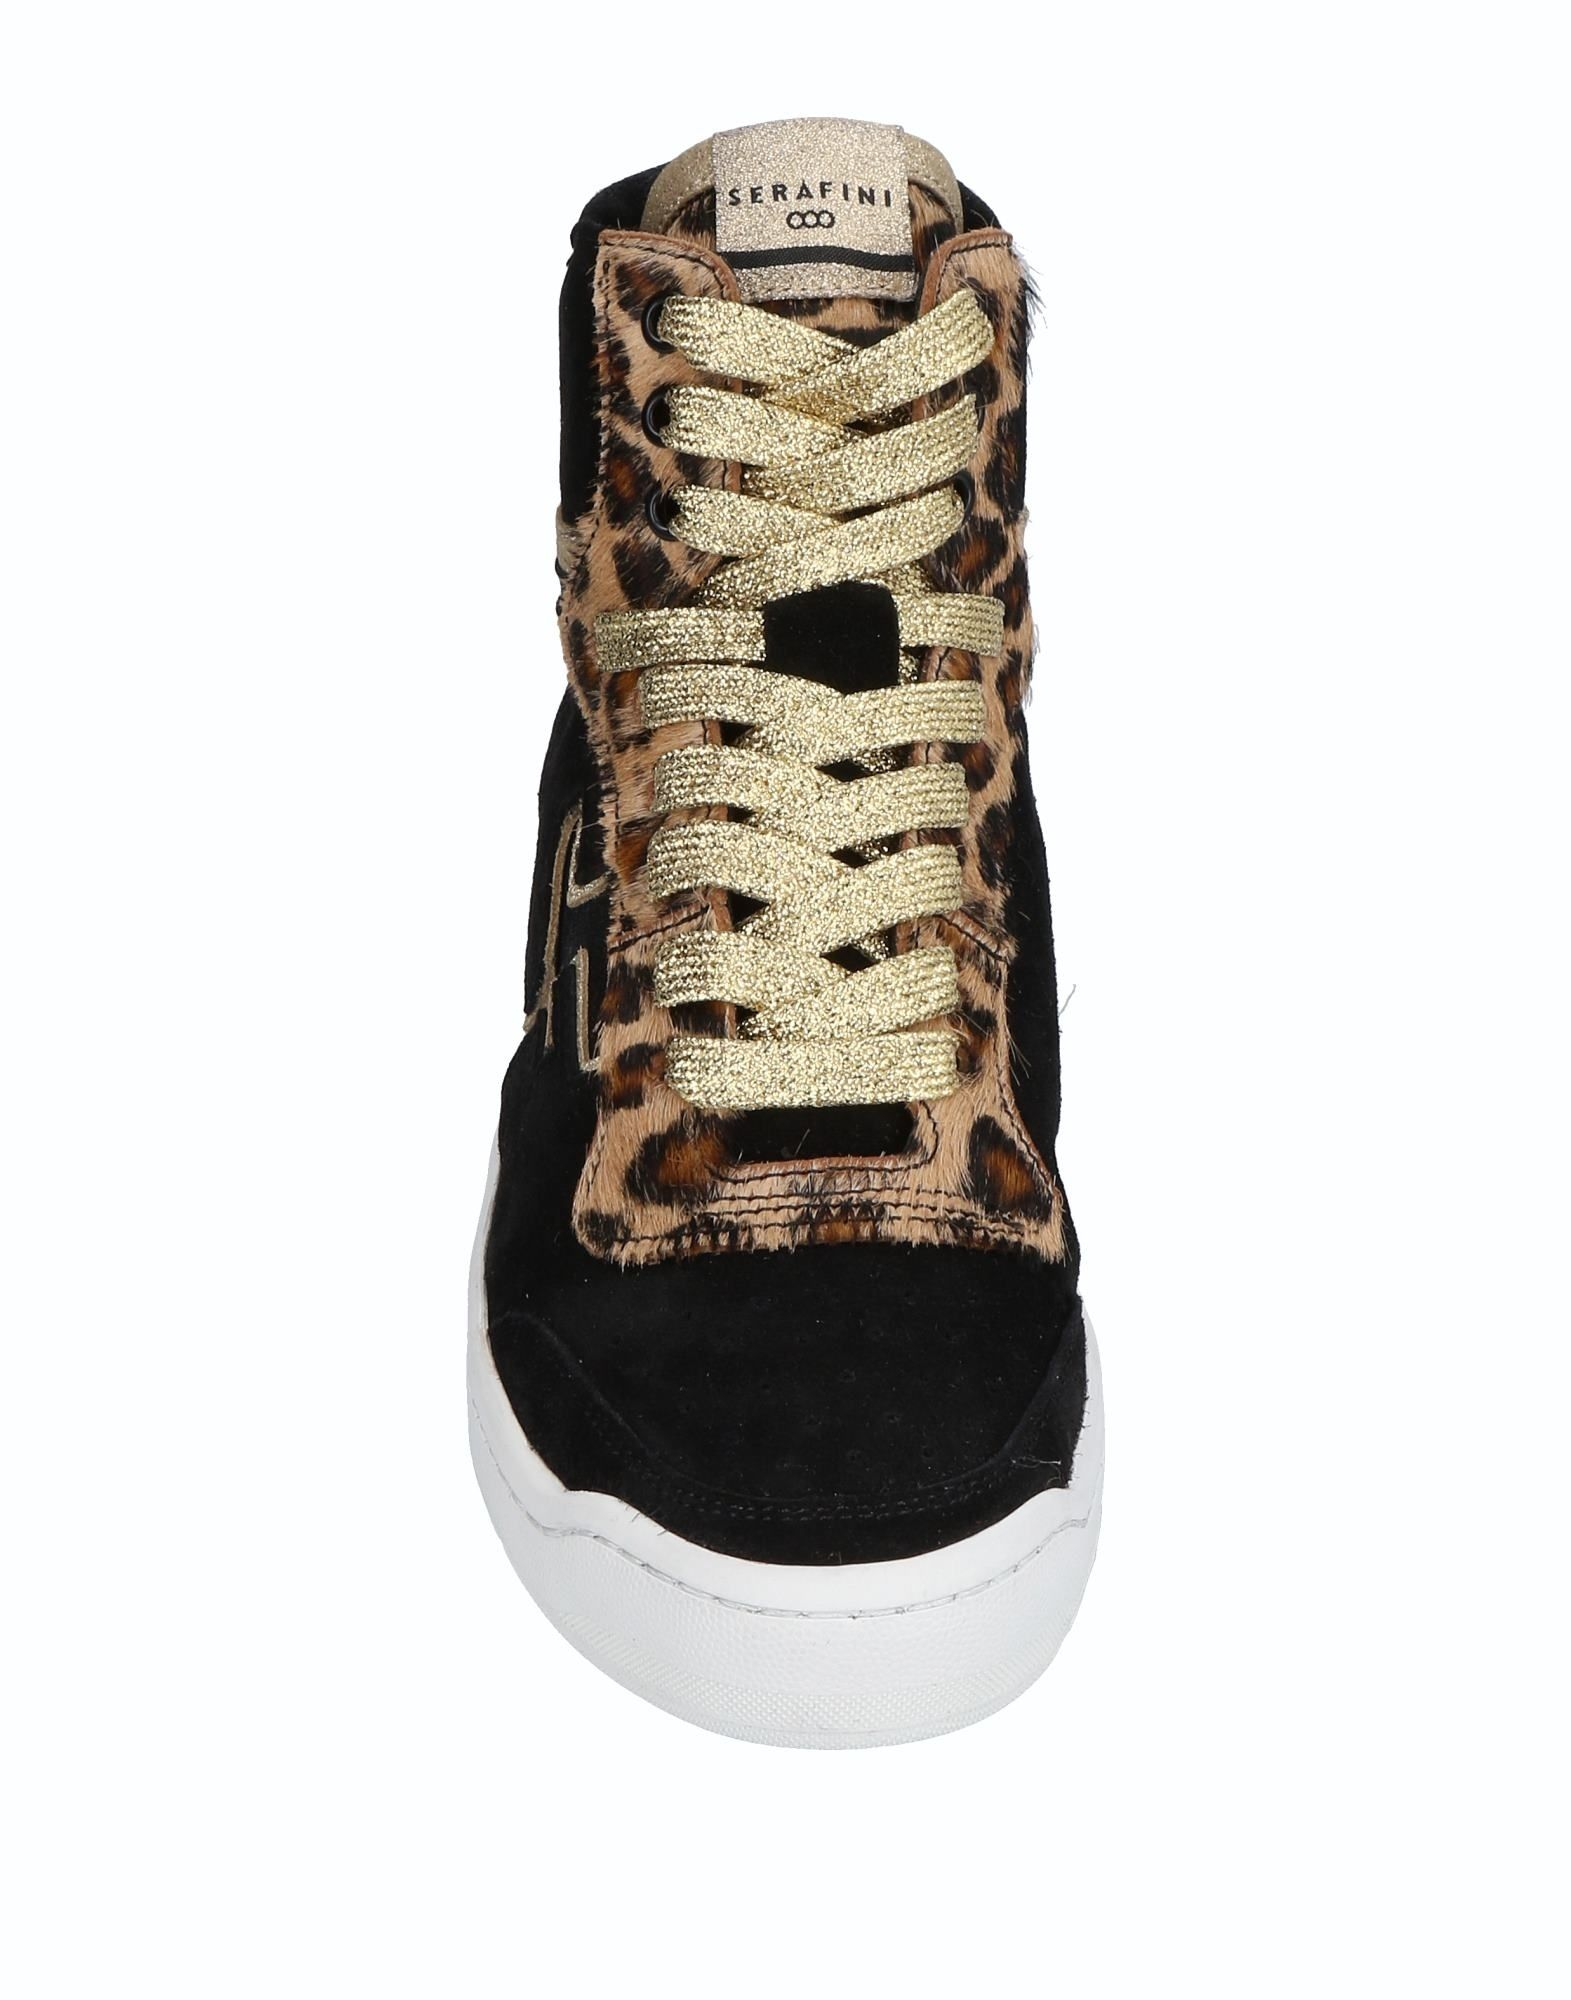 Serafini Serafini Serafini Luxury Sneakers Damen Gutes Preis-Leistungs-Verhältnis, es lohnt sich 063543